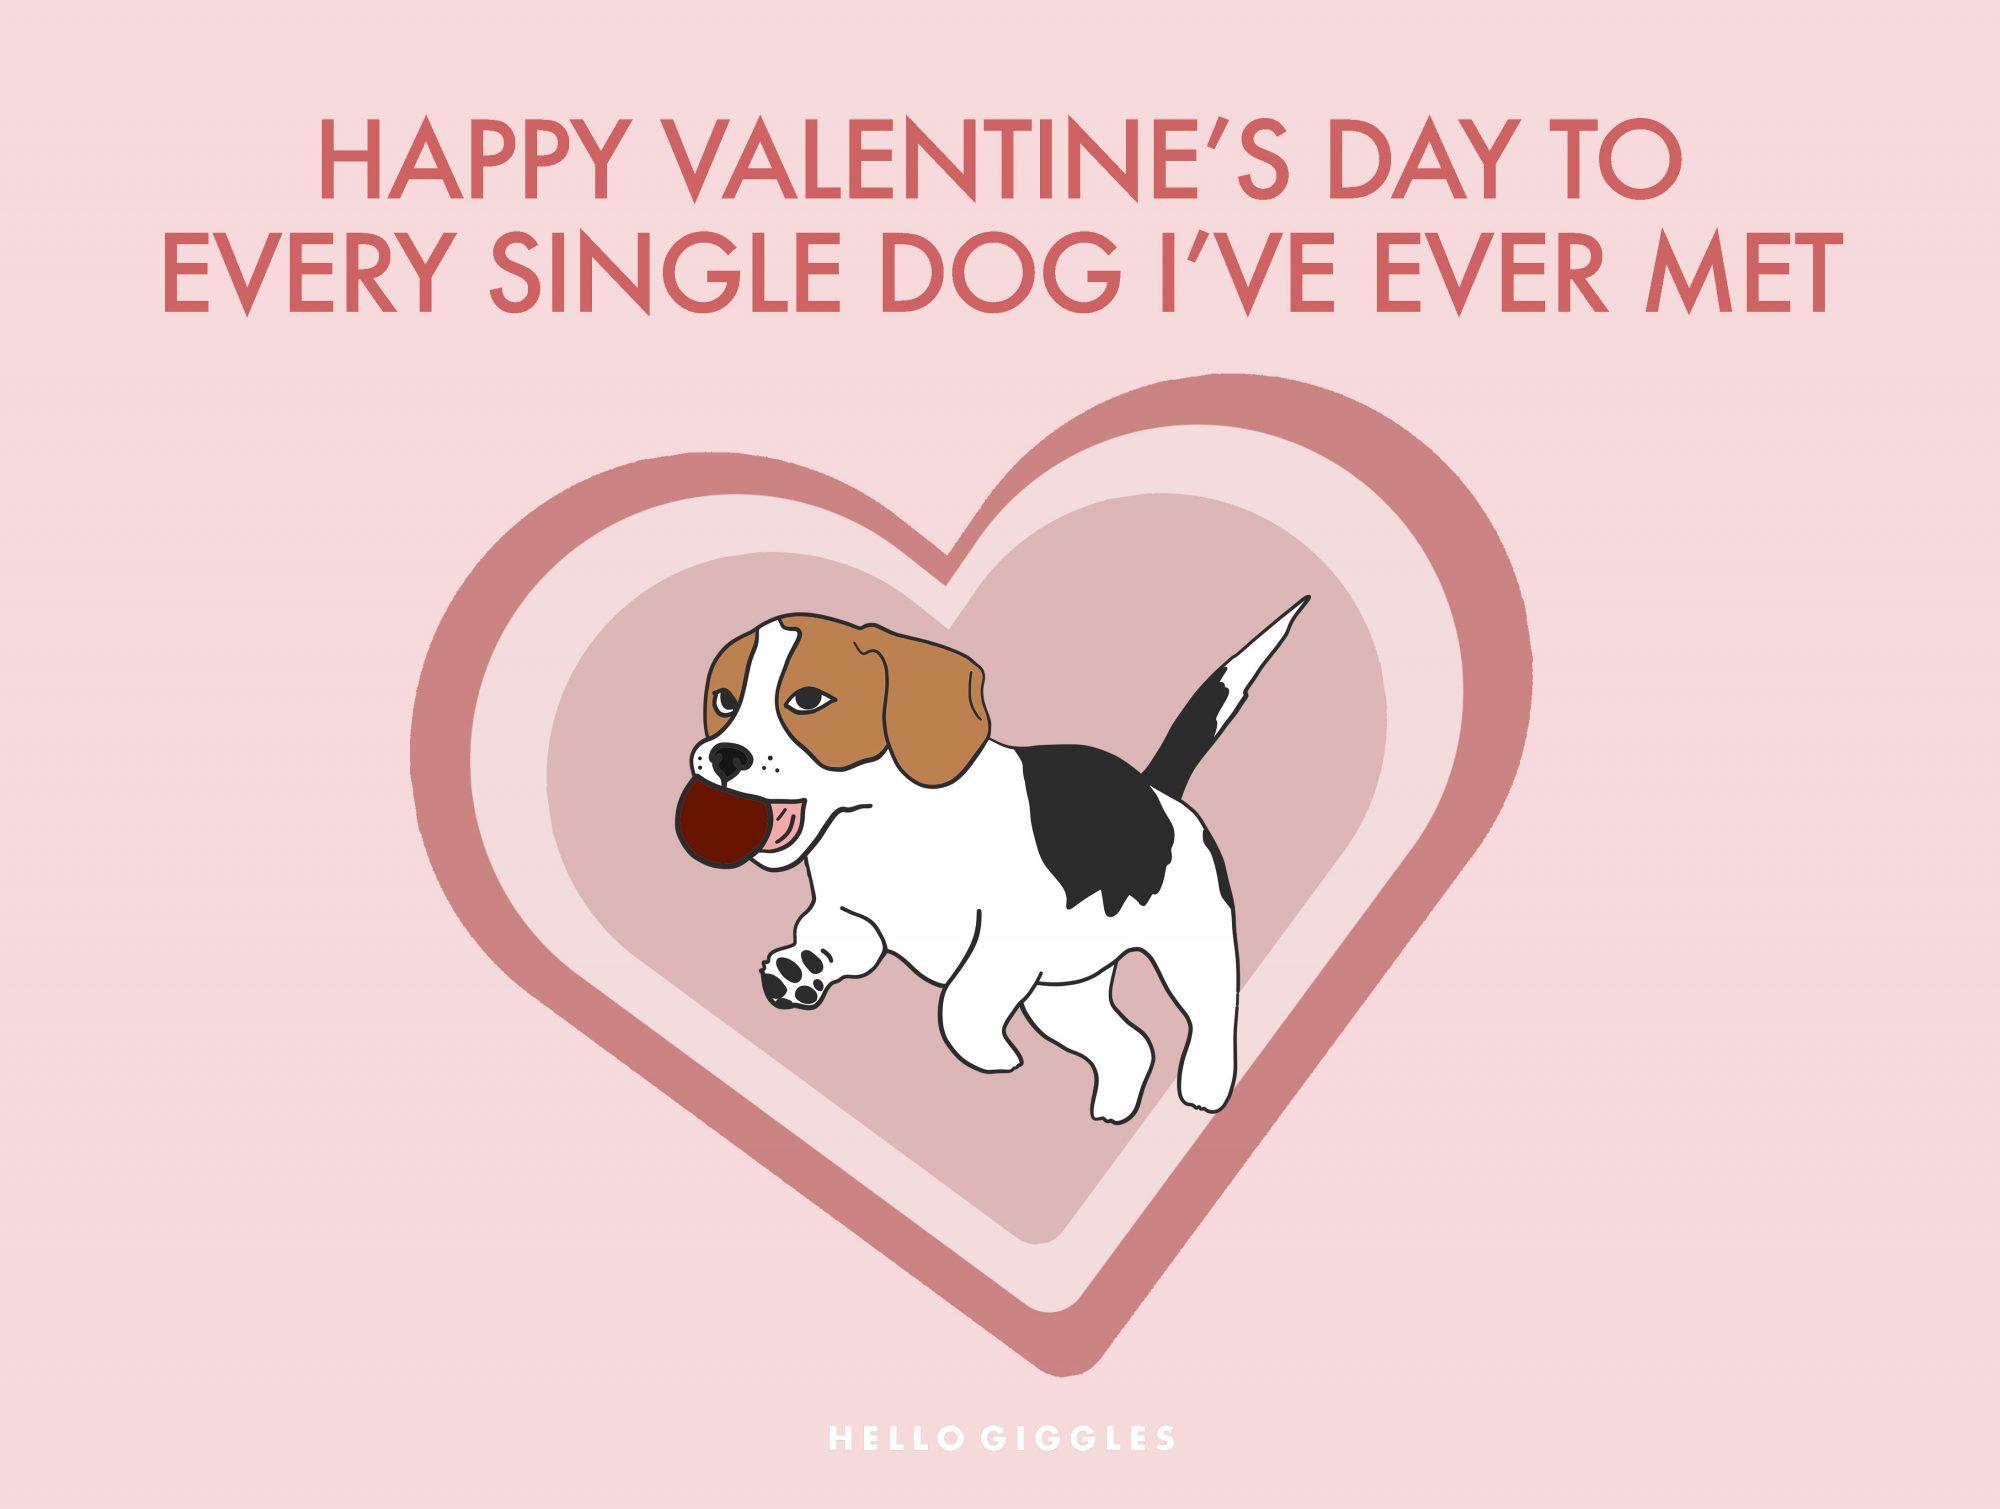 dogpostcard.jpg